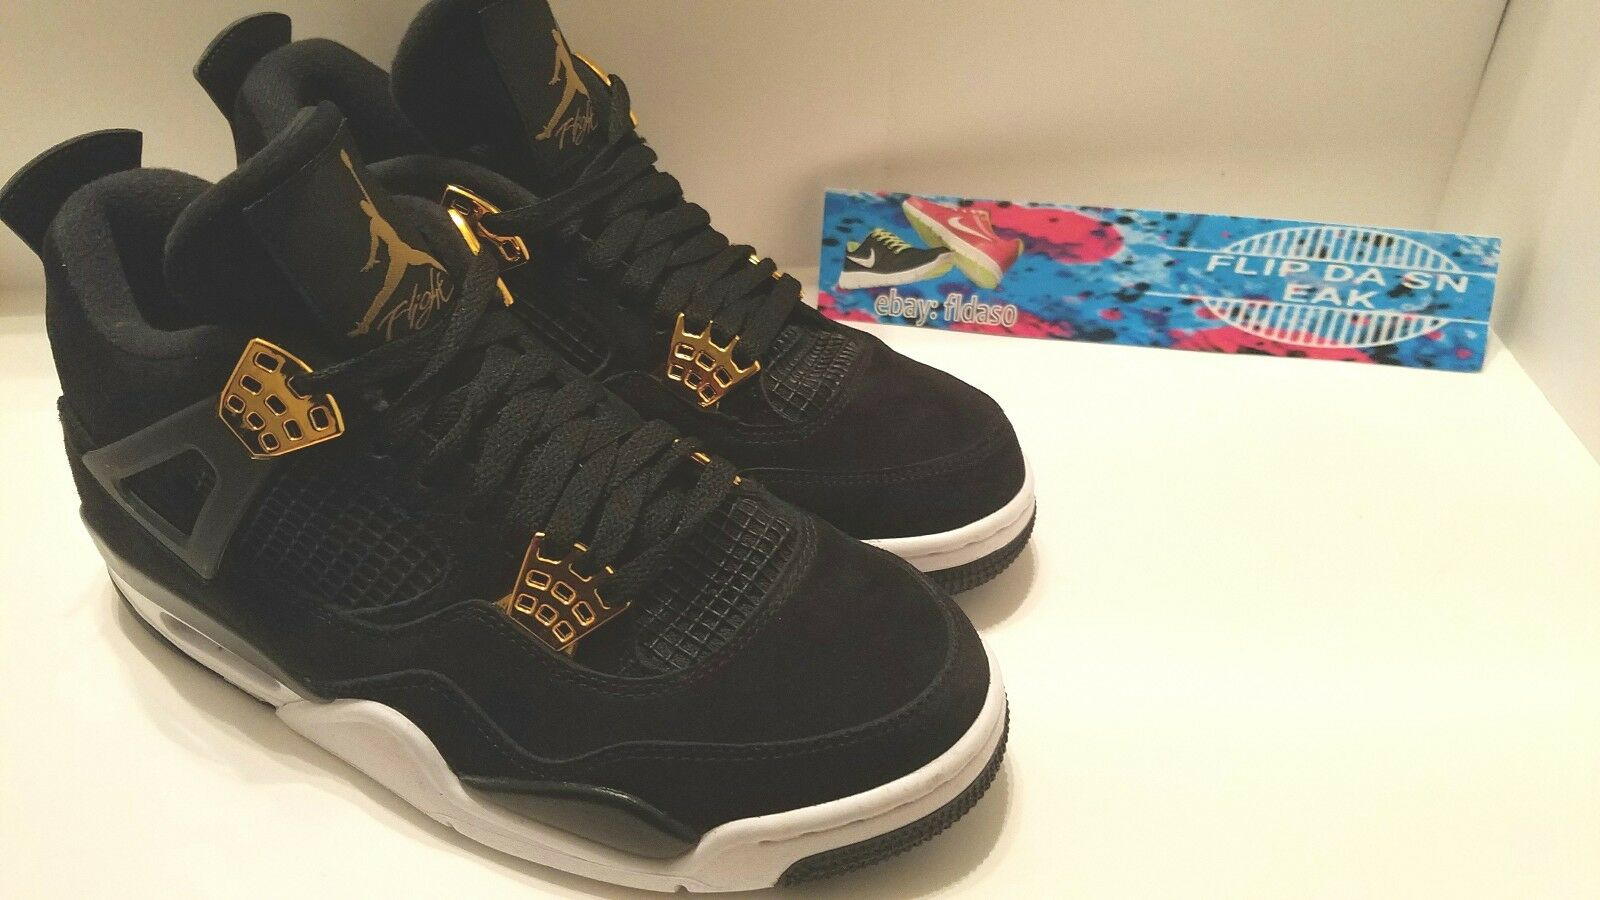 Nike air jordan retro - mens schwarzes gold iv 308497-032 basketball - größe 8